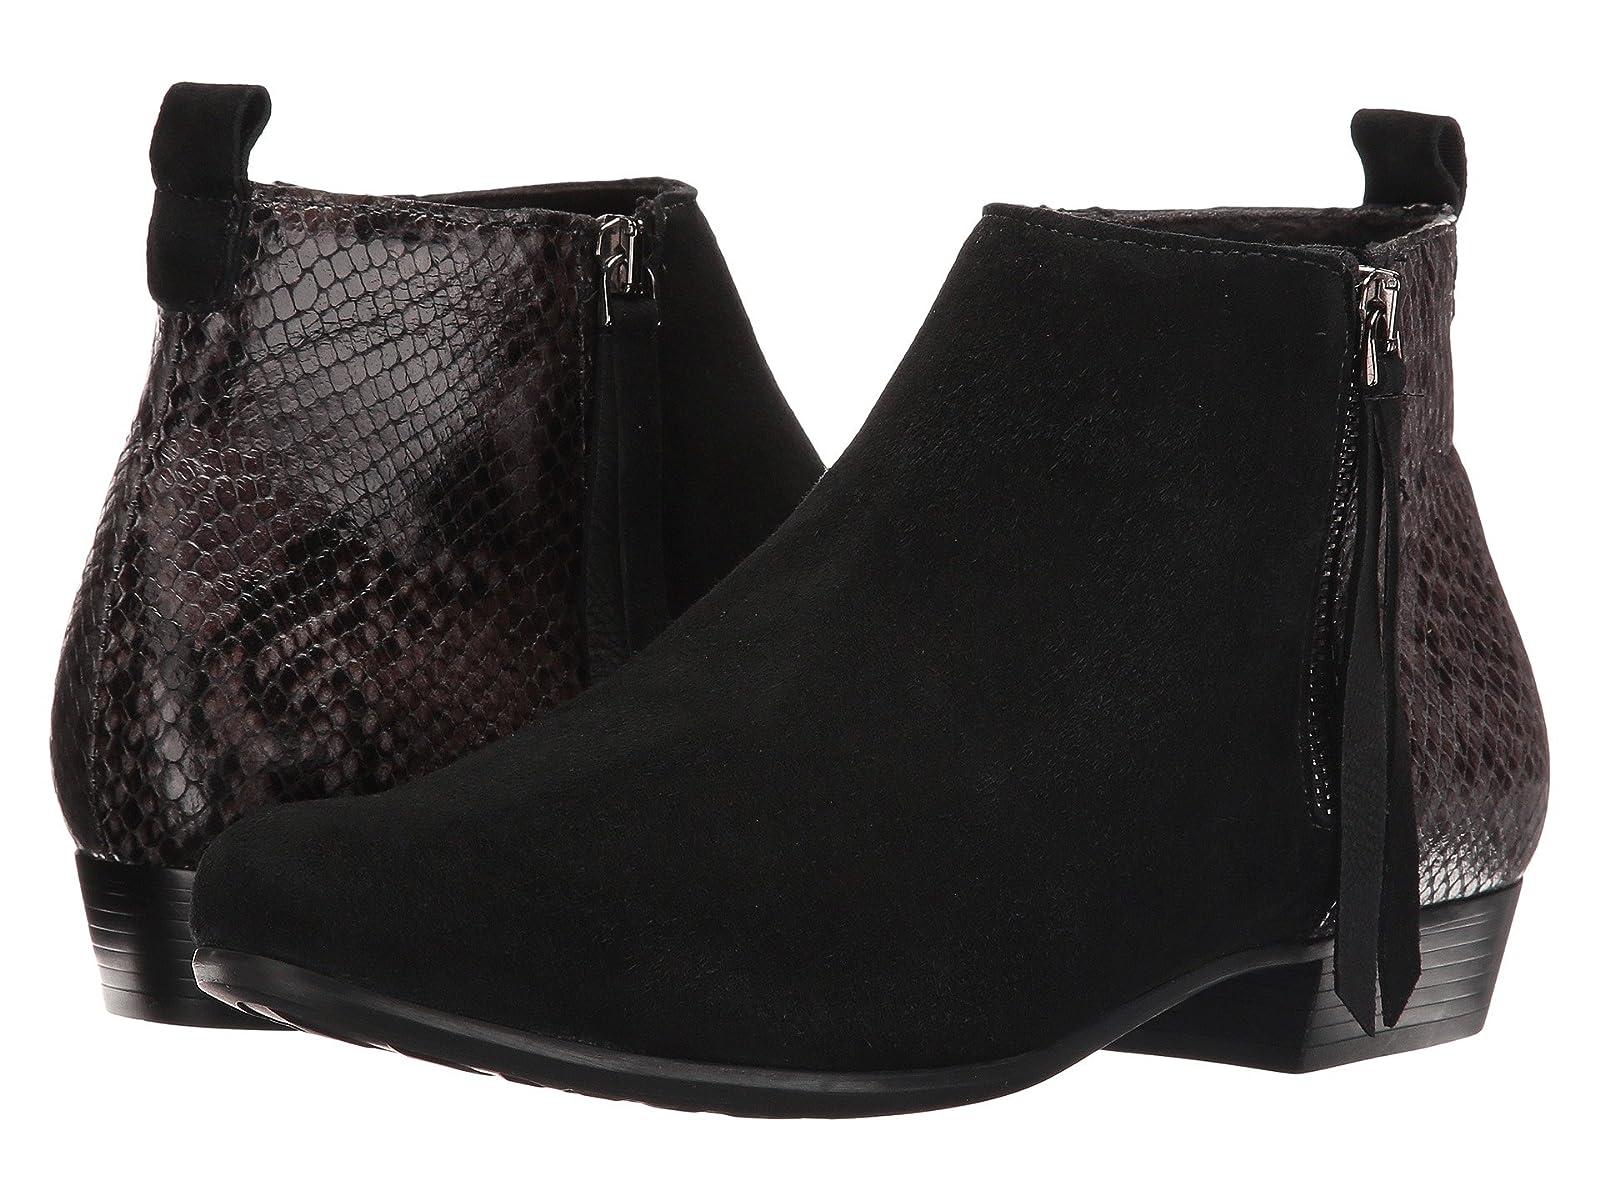 Munro Lexi IICheap and distinctive eye-catching shoes